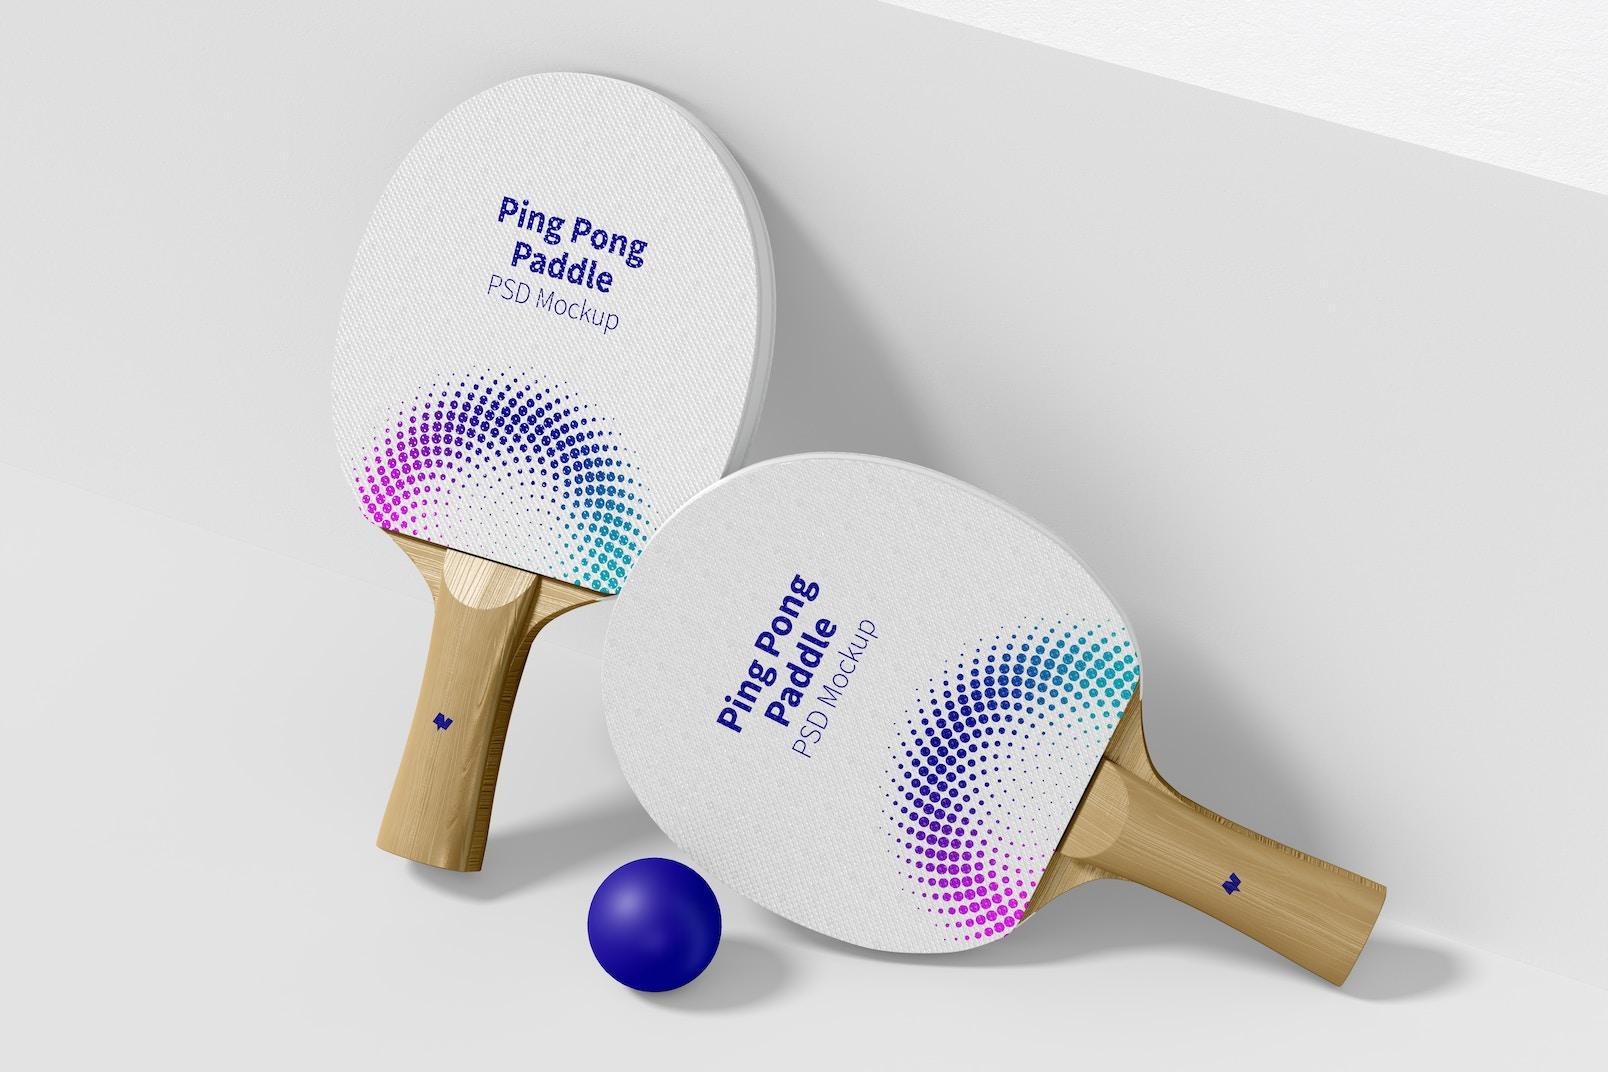 Ping Pong Paddles Mockup, Leaned